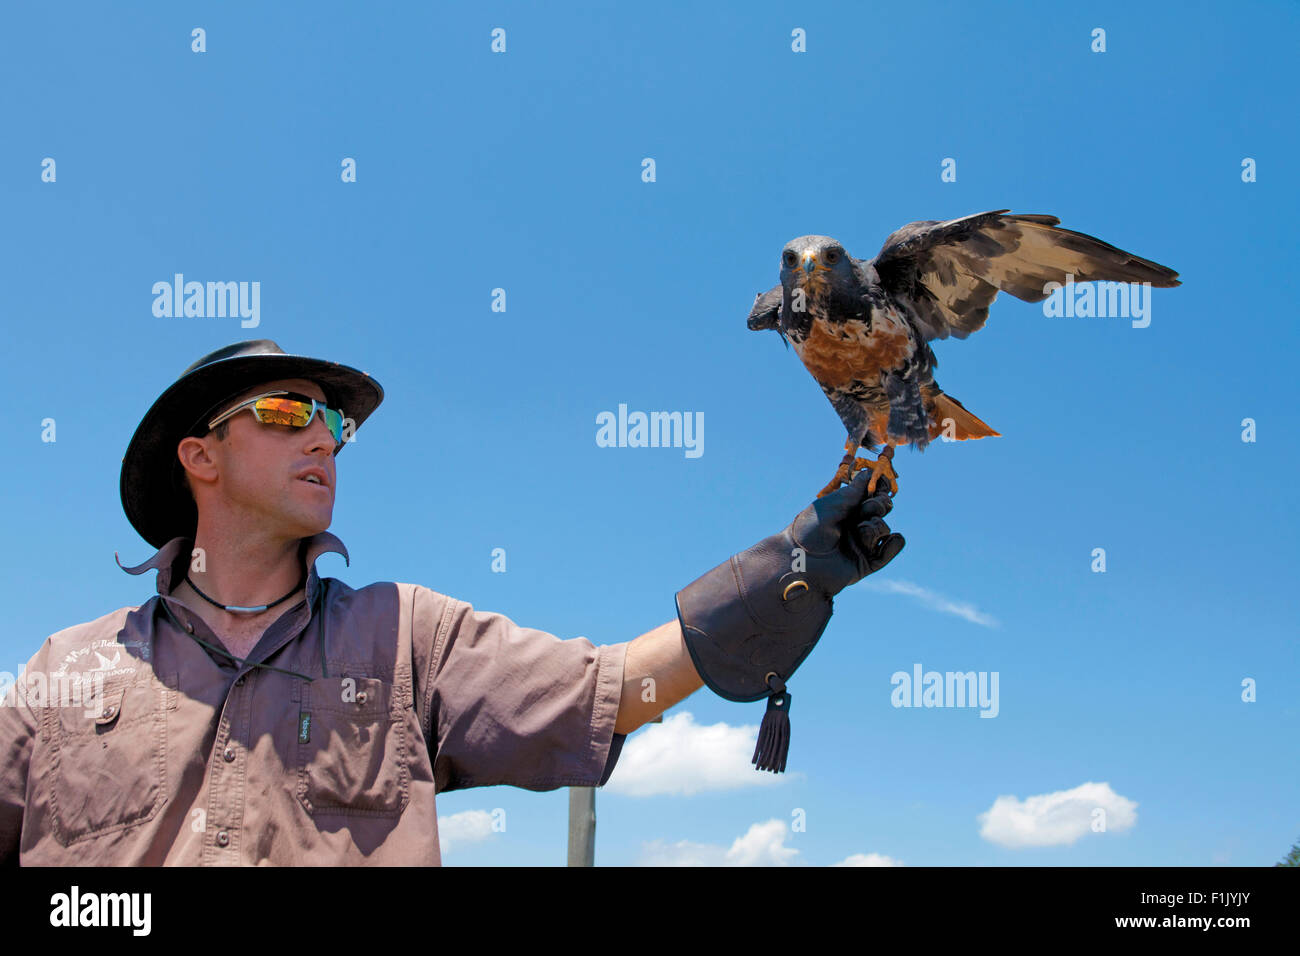 Falconer - Stock Image